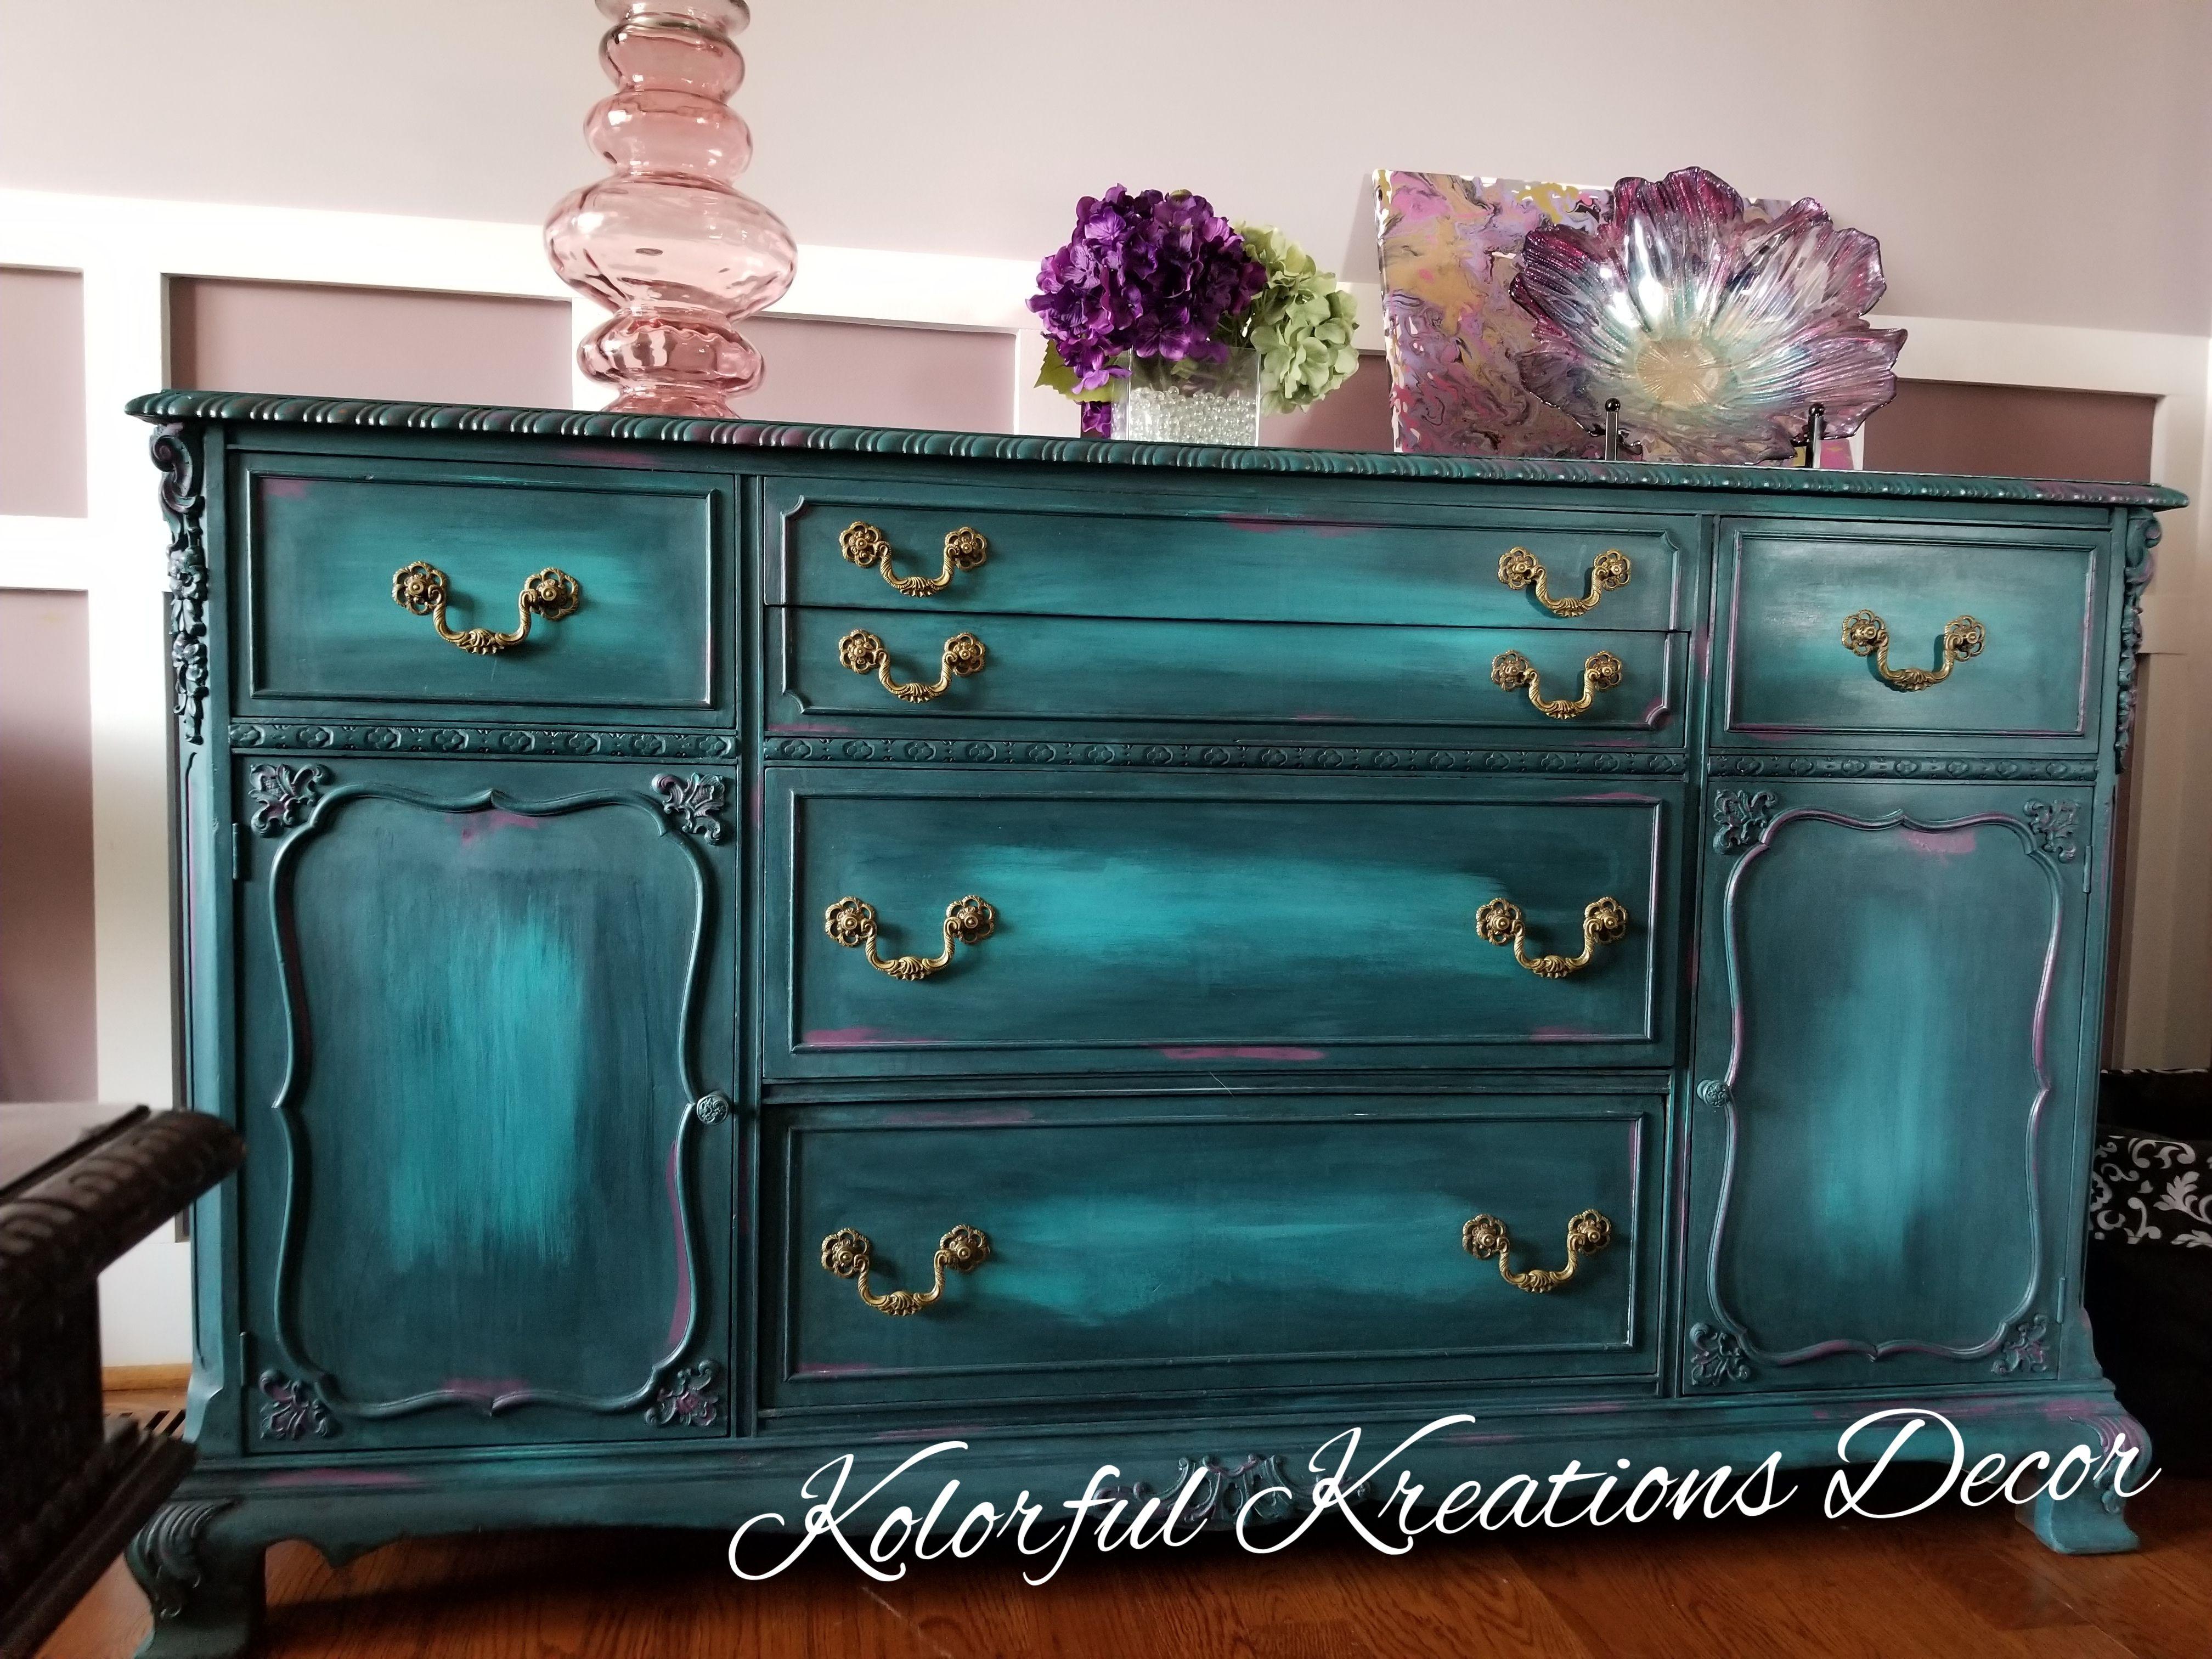 Pin by Karen Walthall on Kolorful Kreations Decor | Pinterest